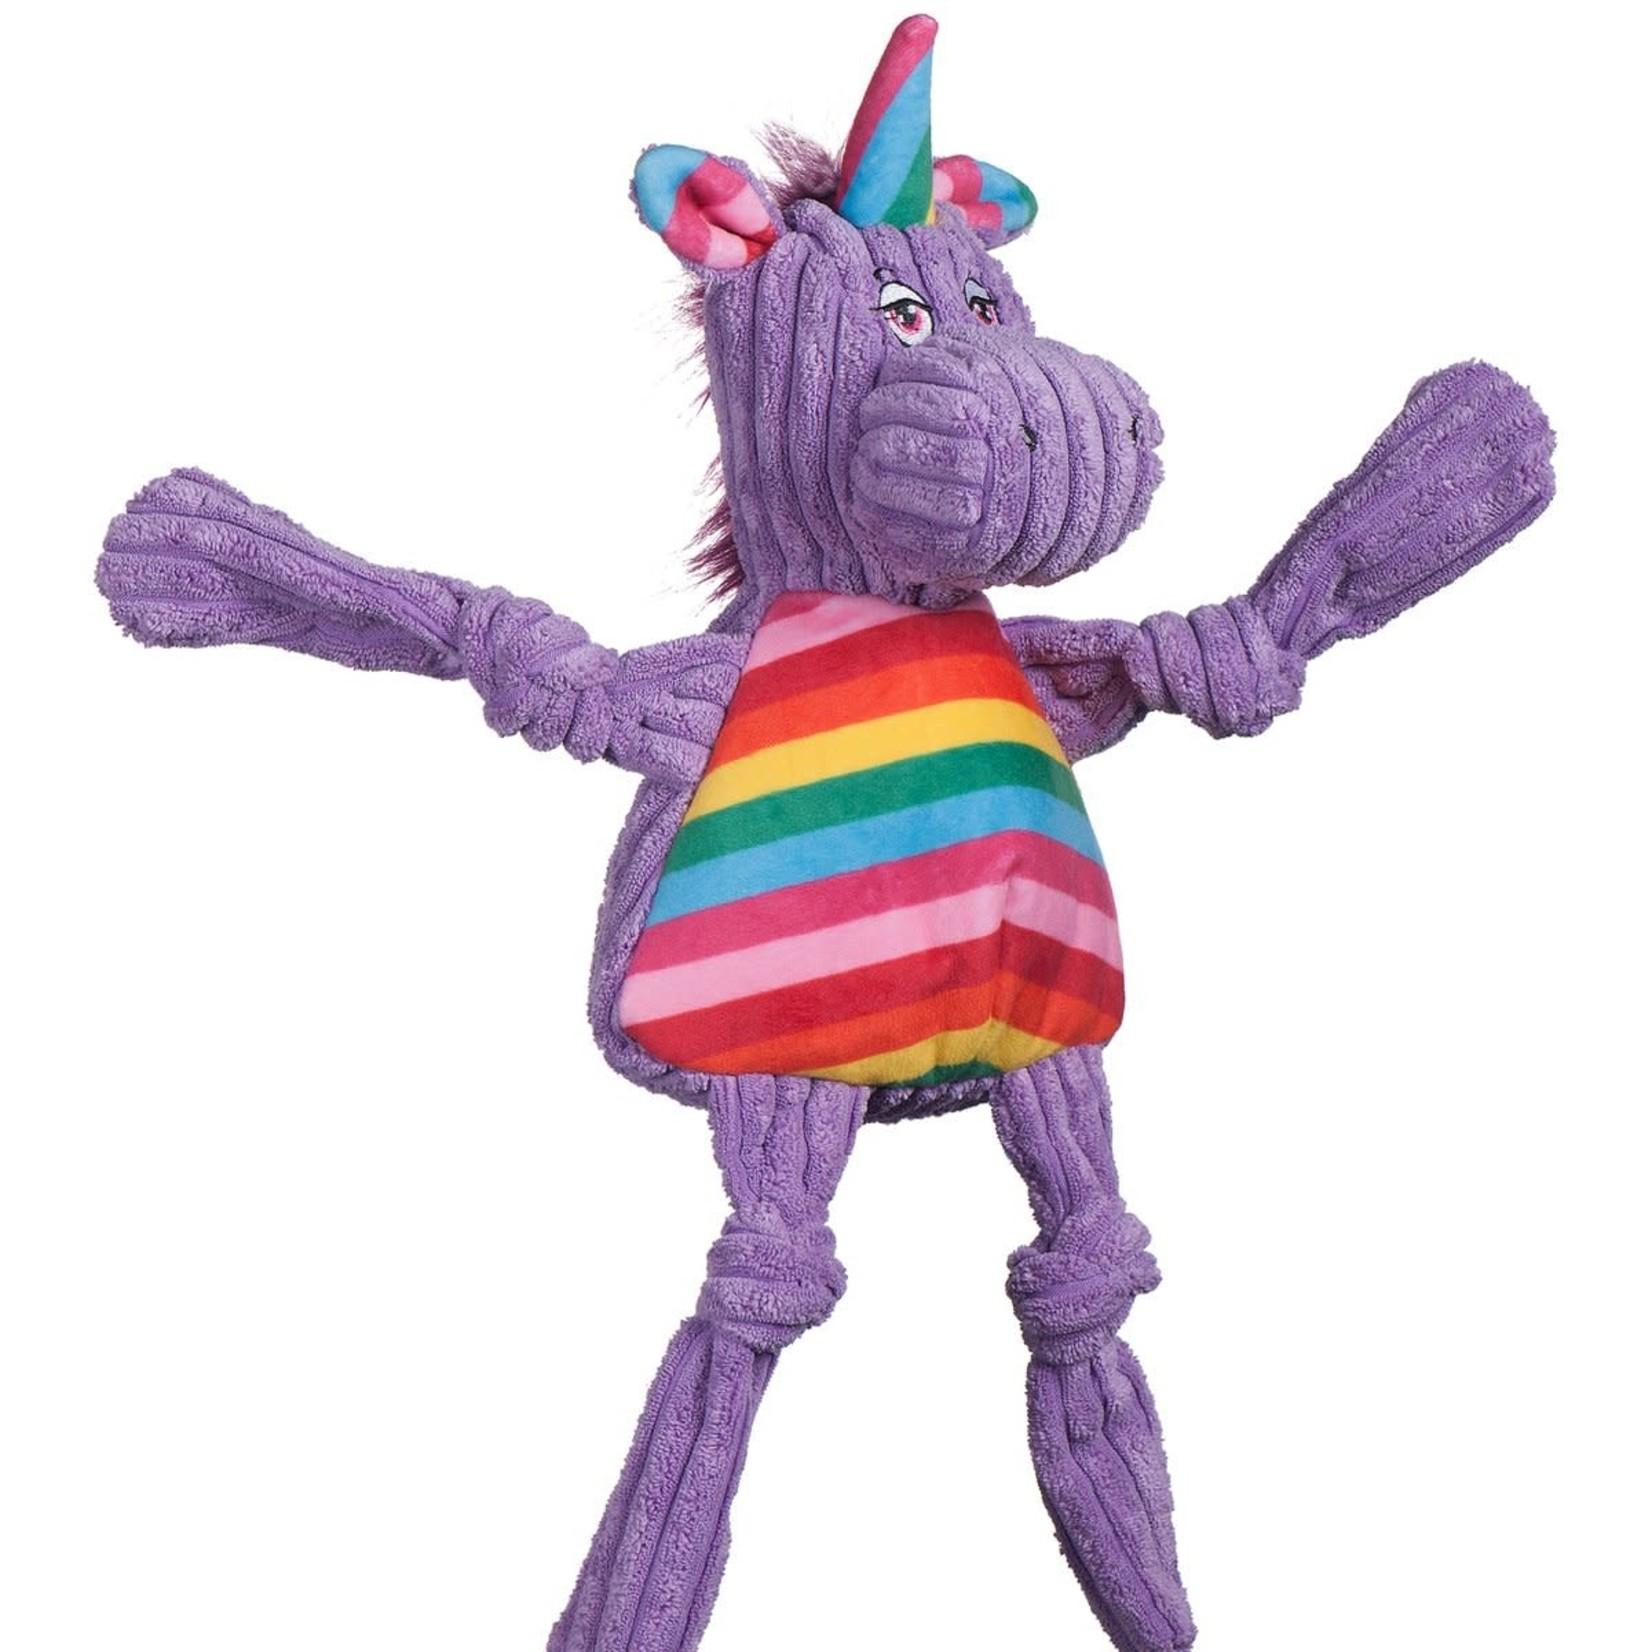 HuggleHounds HuggleHounds Knotties Rainbow Unicorn Large